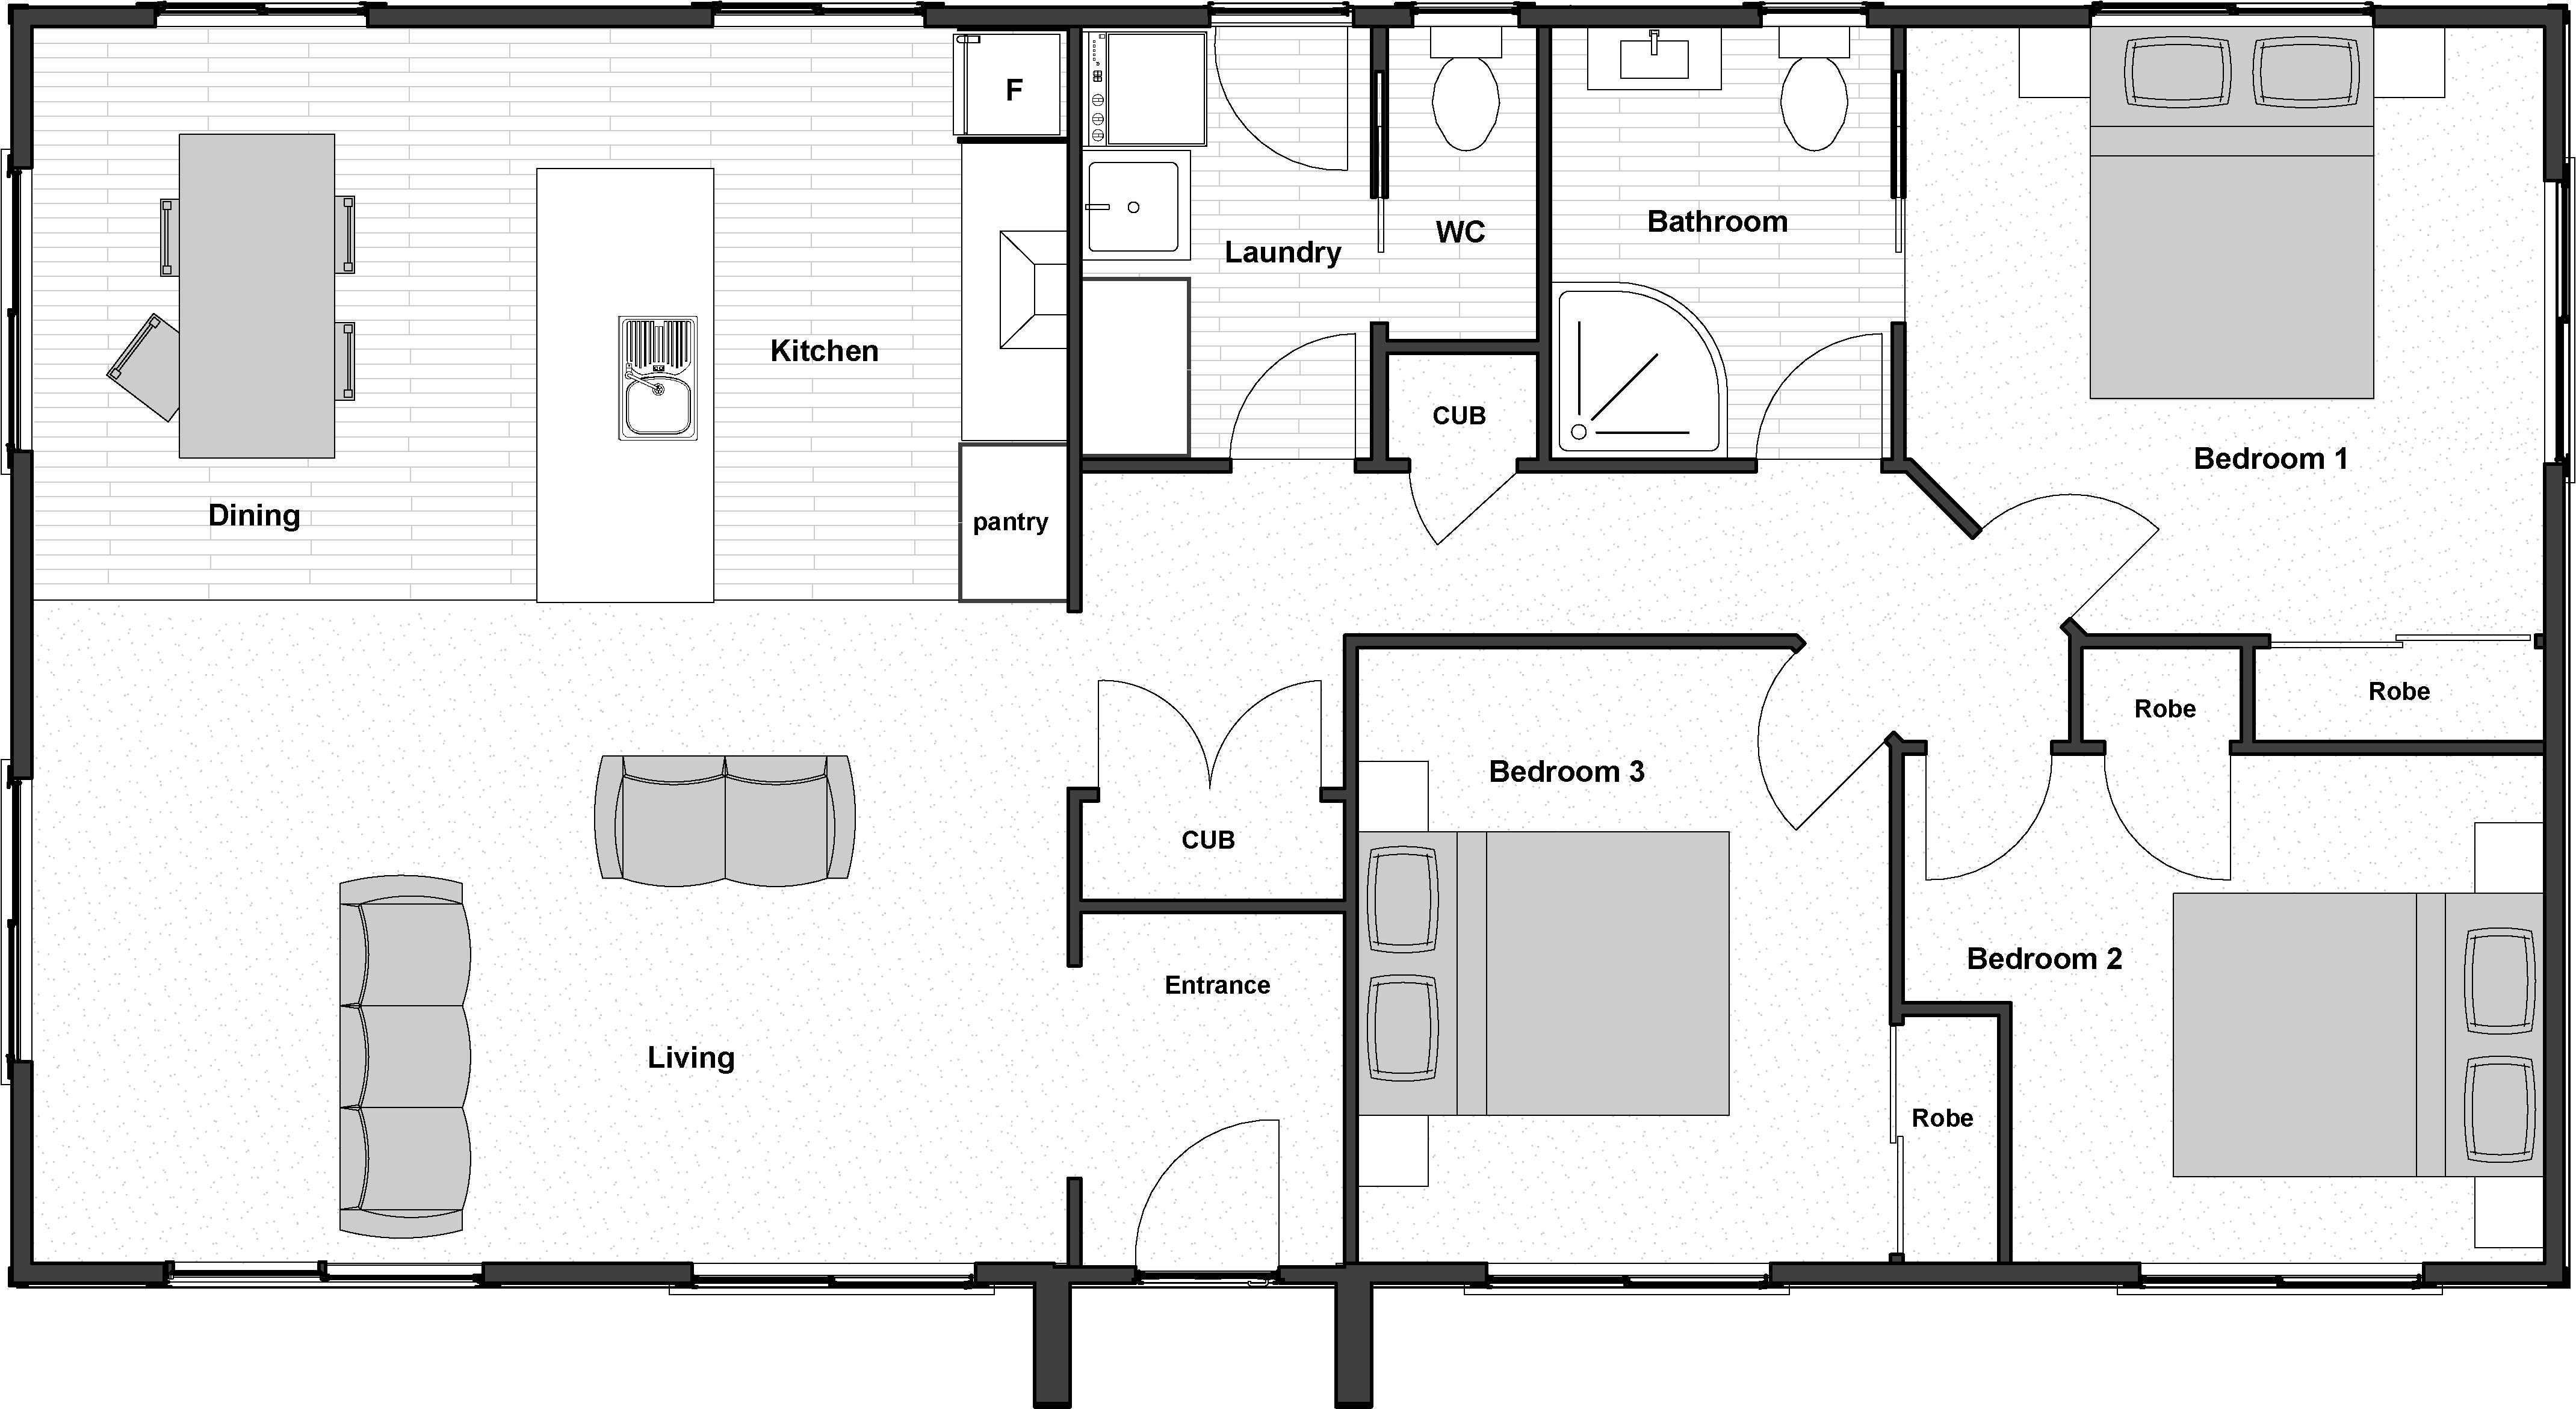 3 bedroom prefab house floorplan